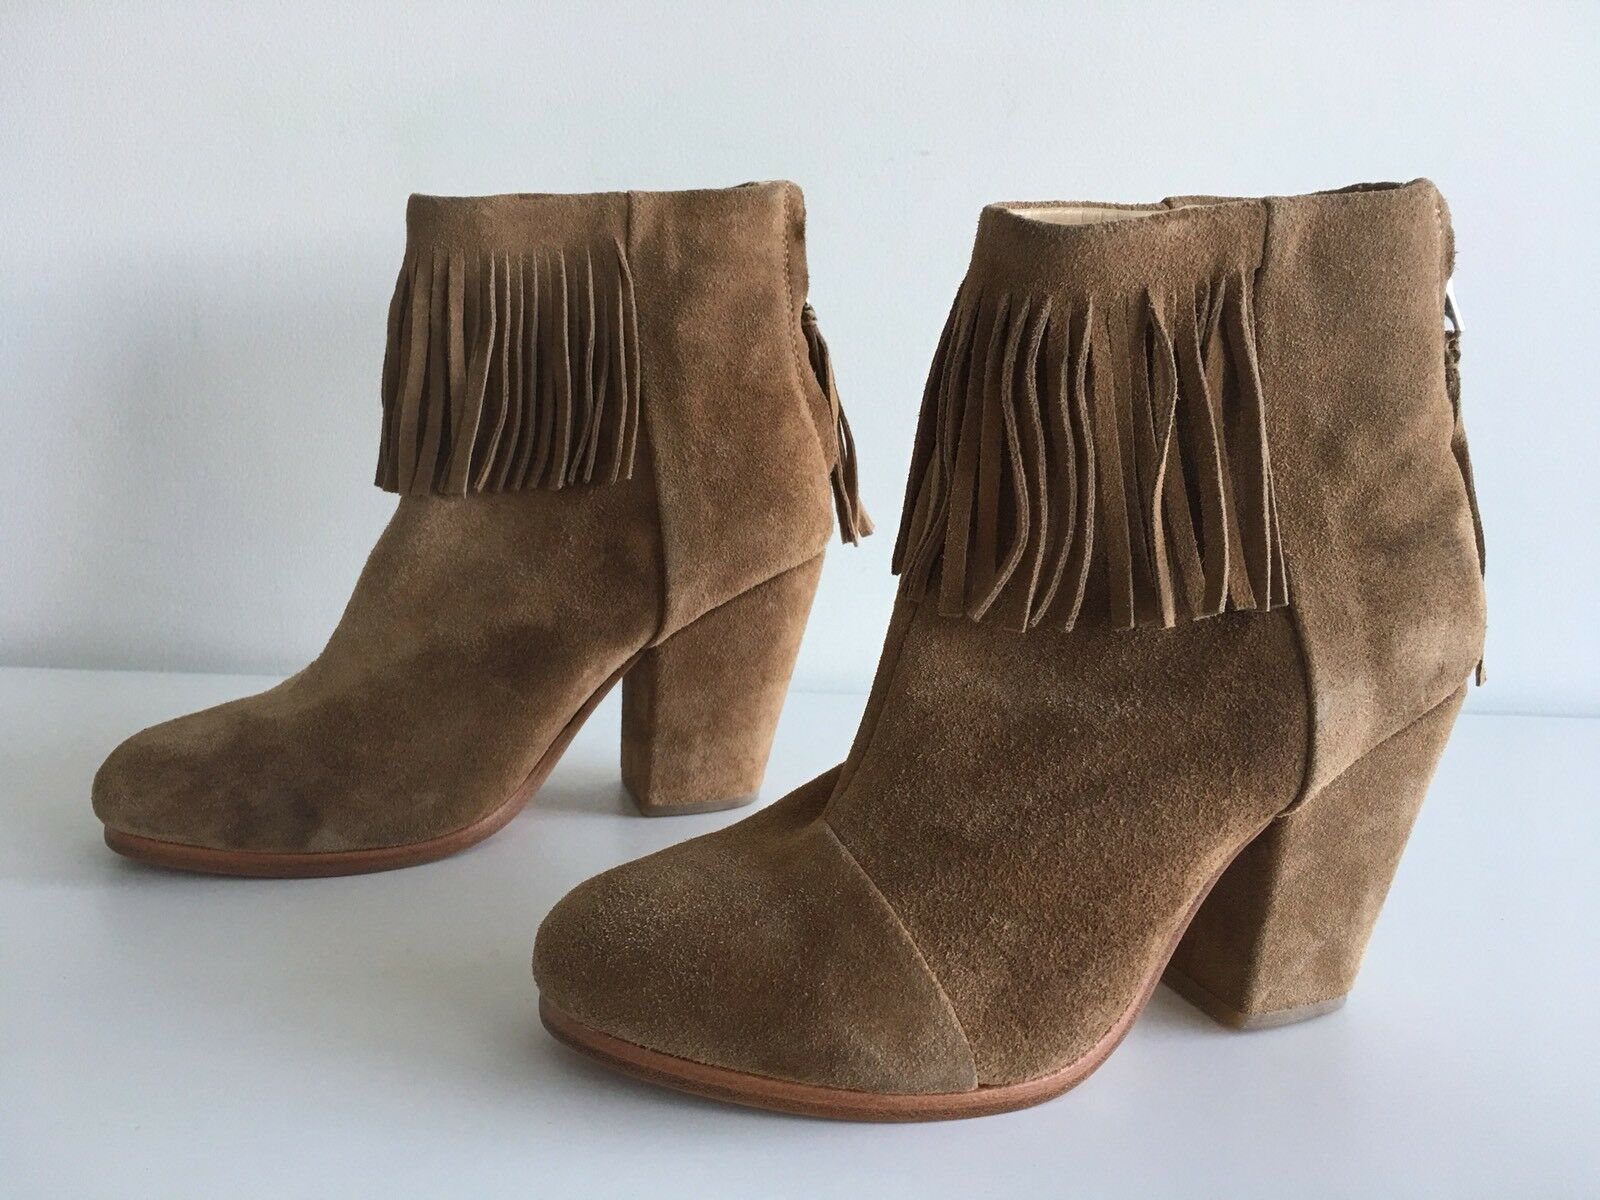 Rag & Bone Bone Bone Newbury flecos de gamuza tobillo bota, Camel. Talla 36.5  autentico en linea